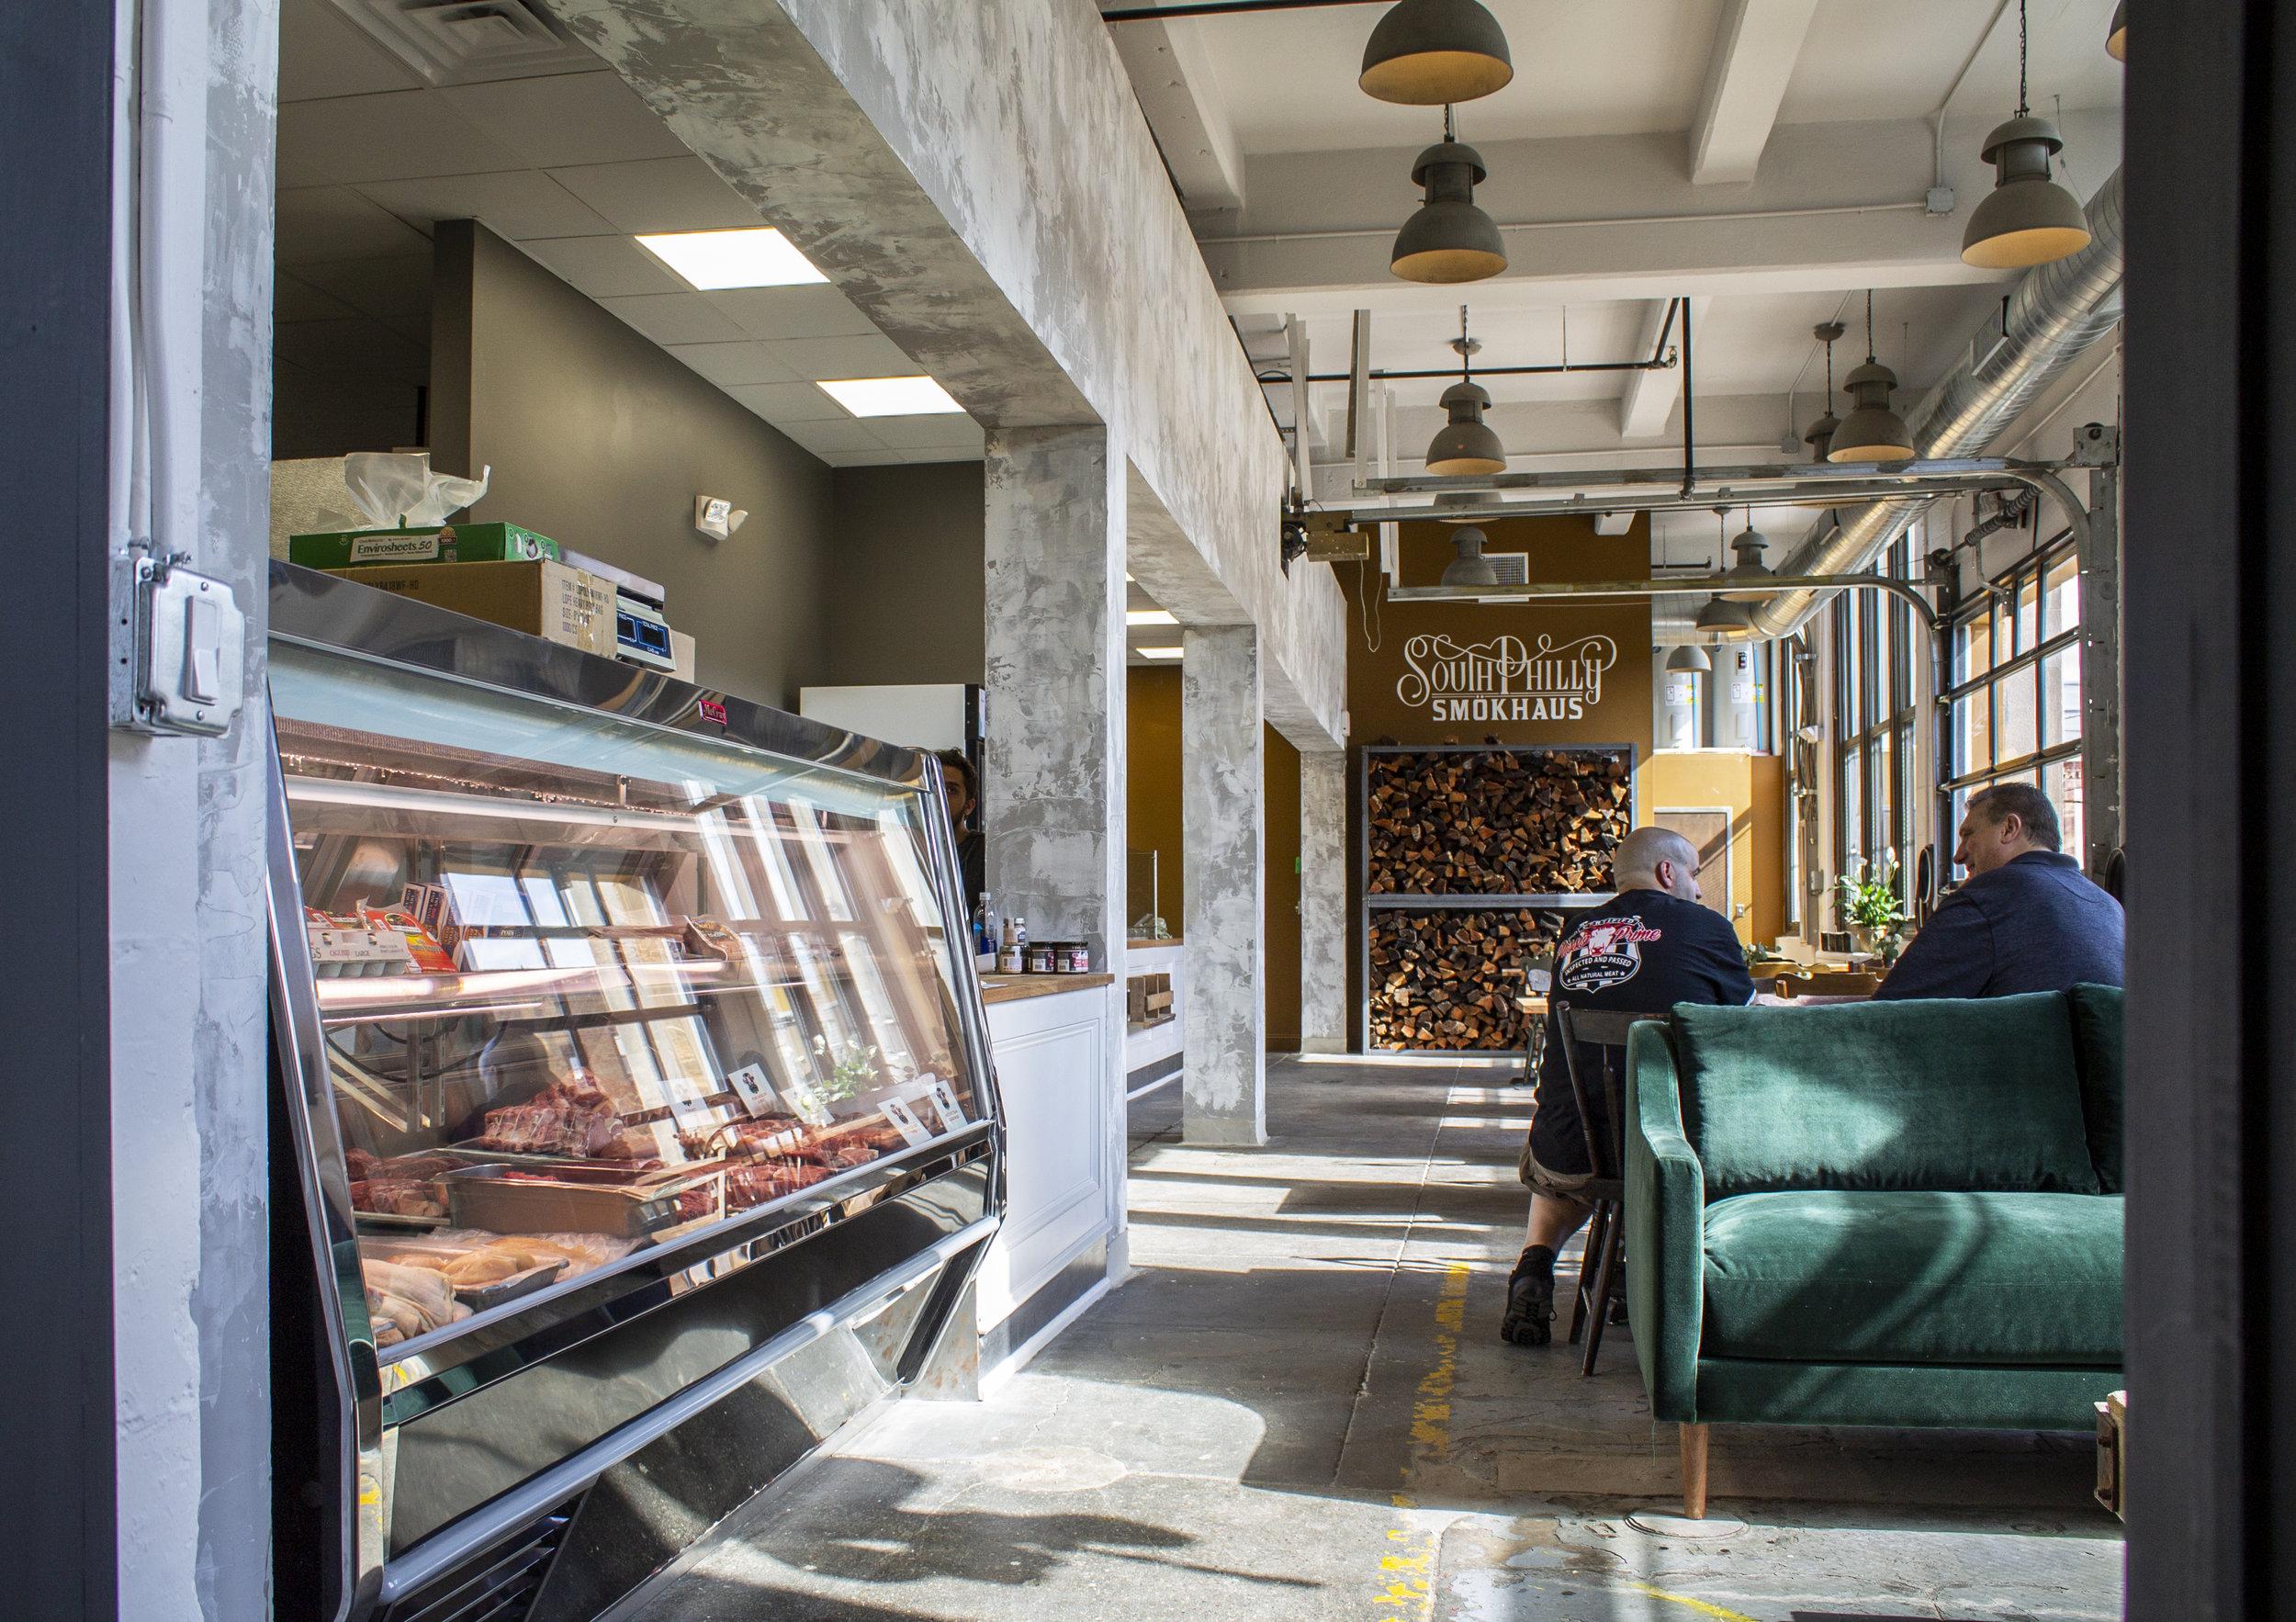 Passio's Prime Meats counter